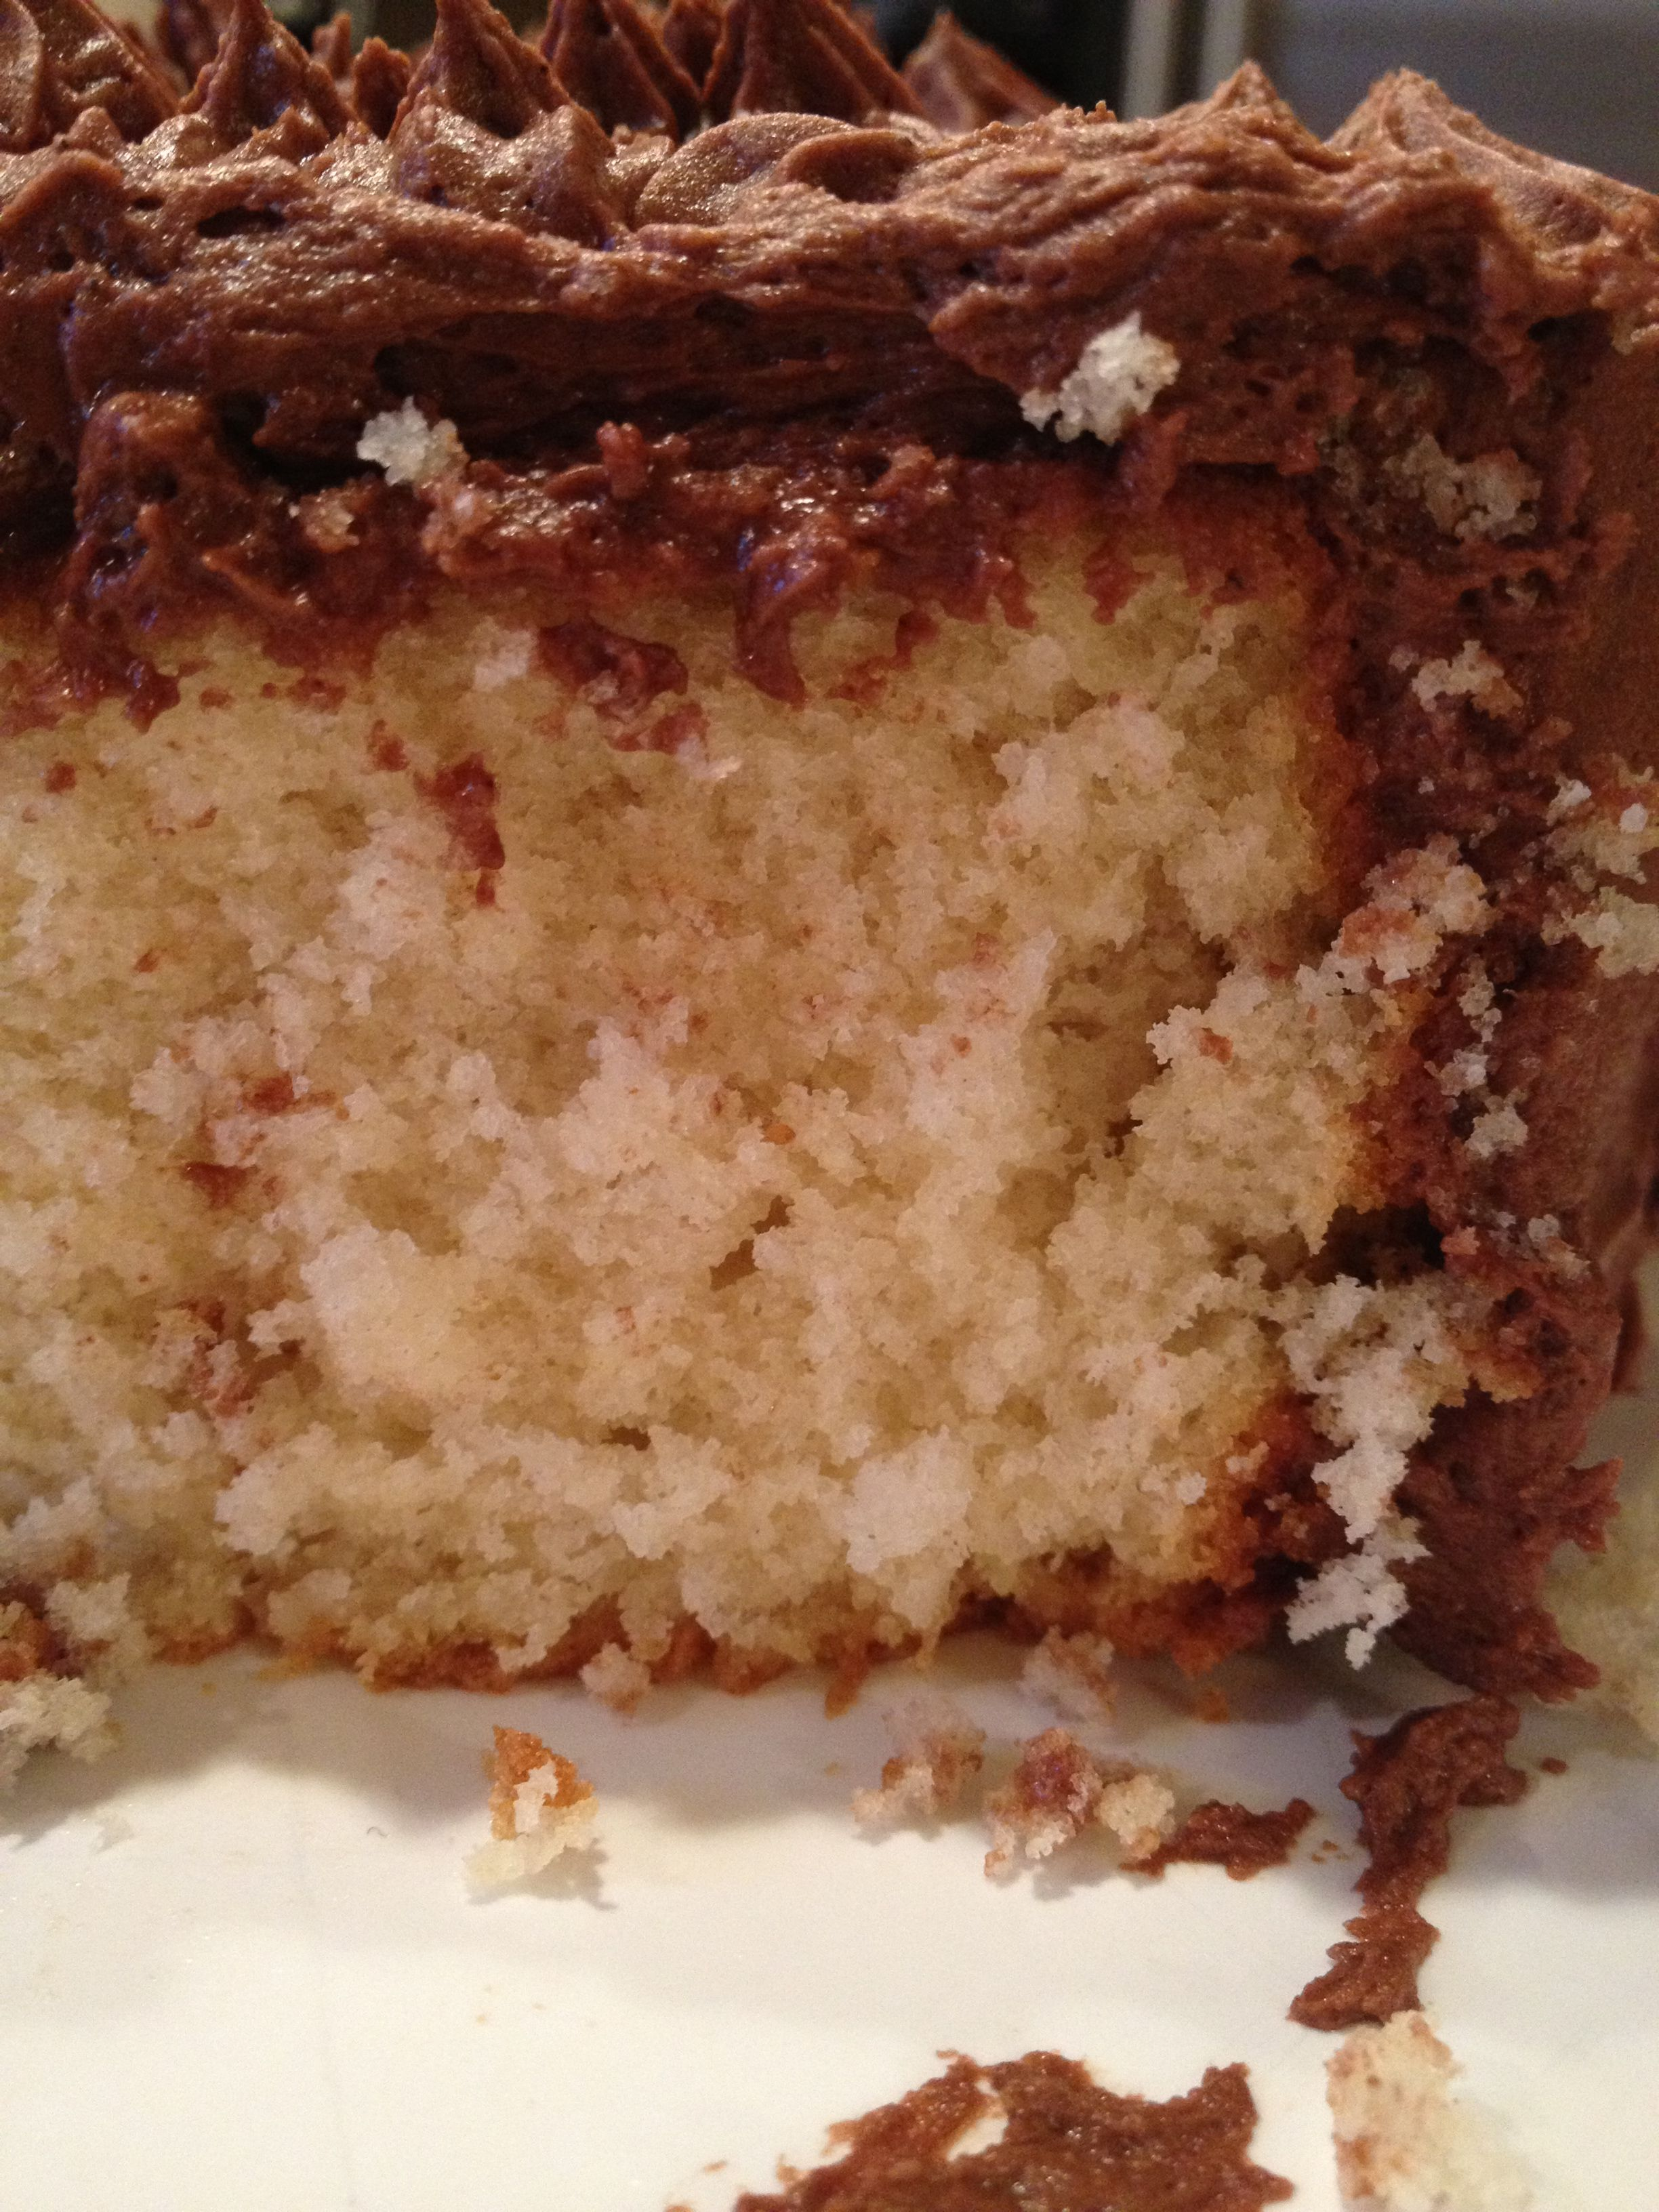 Best ever yellow cake recipe from McCall's magazine ...